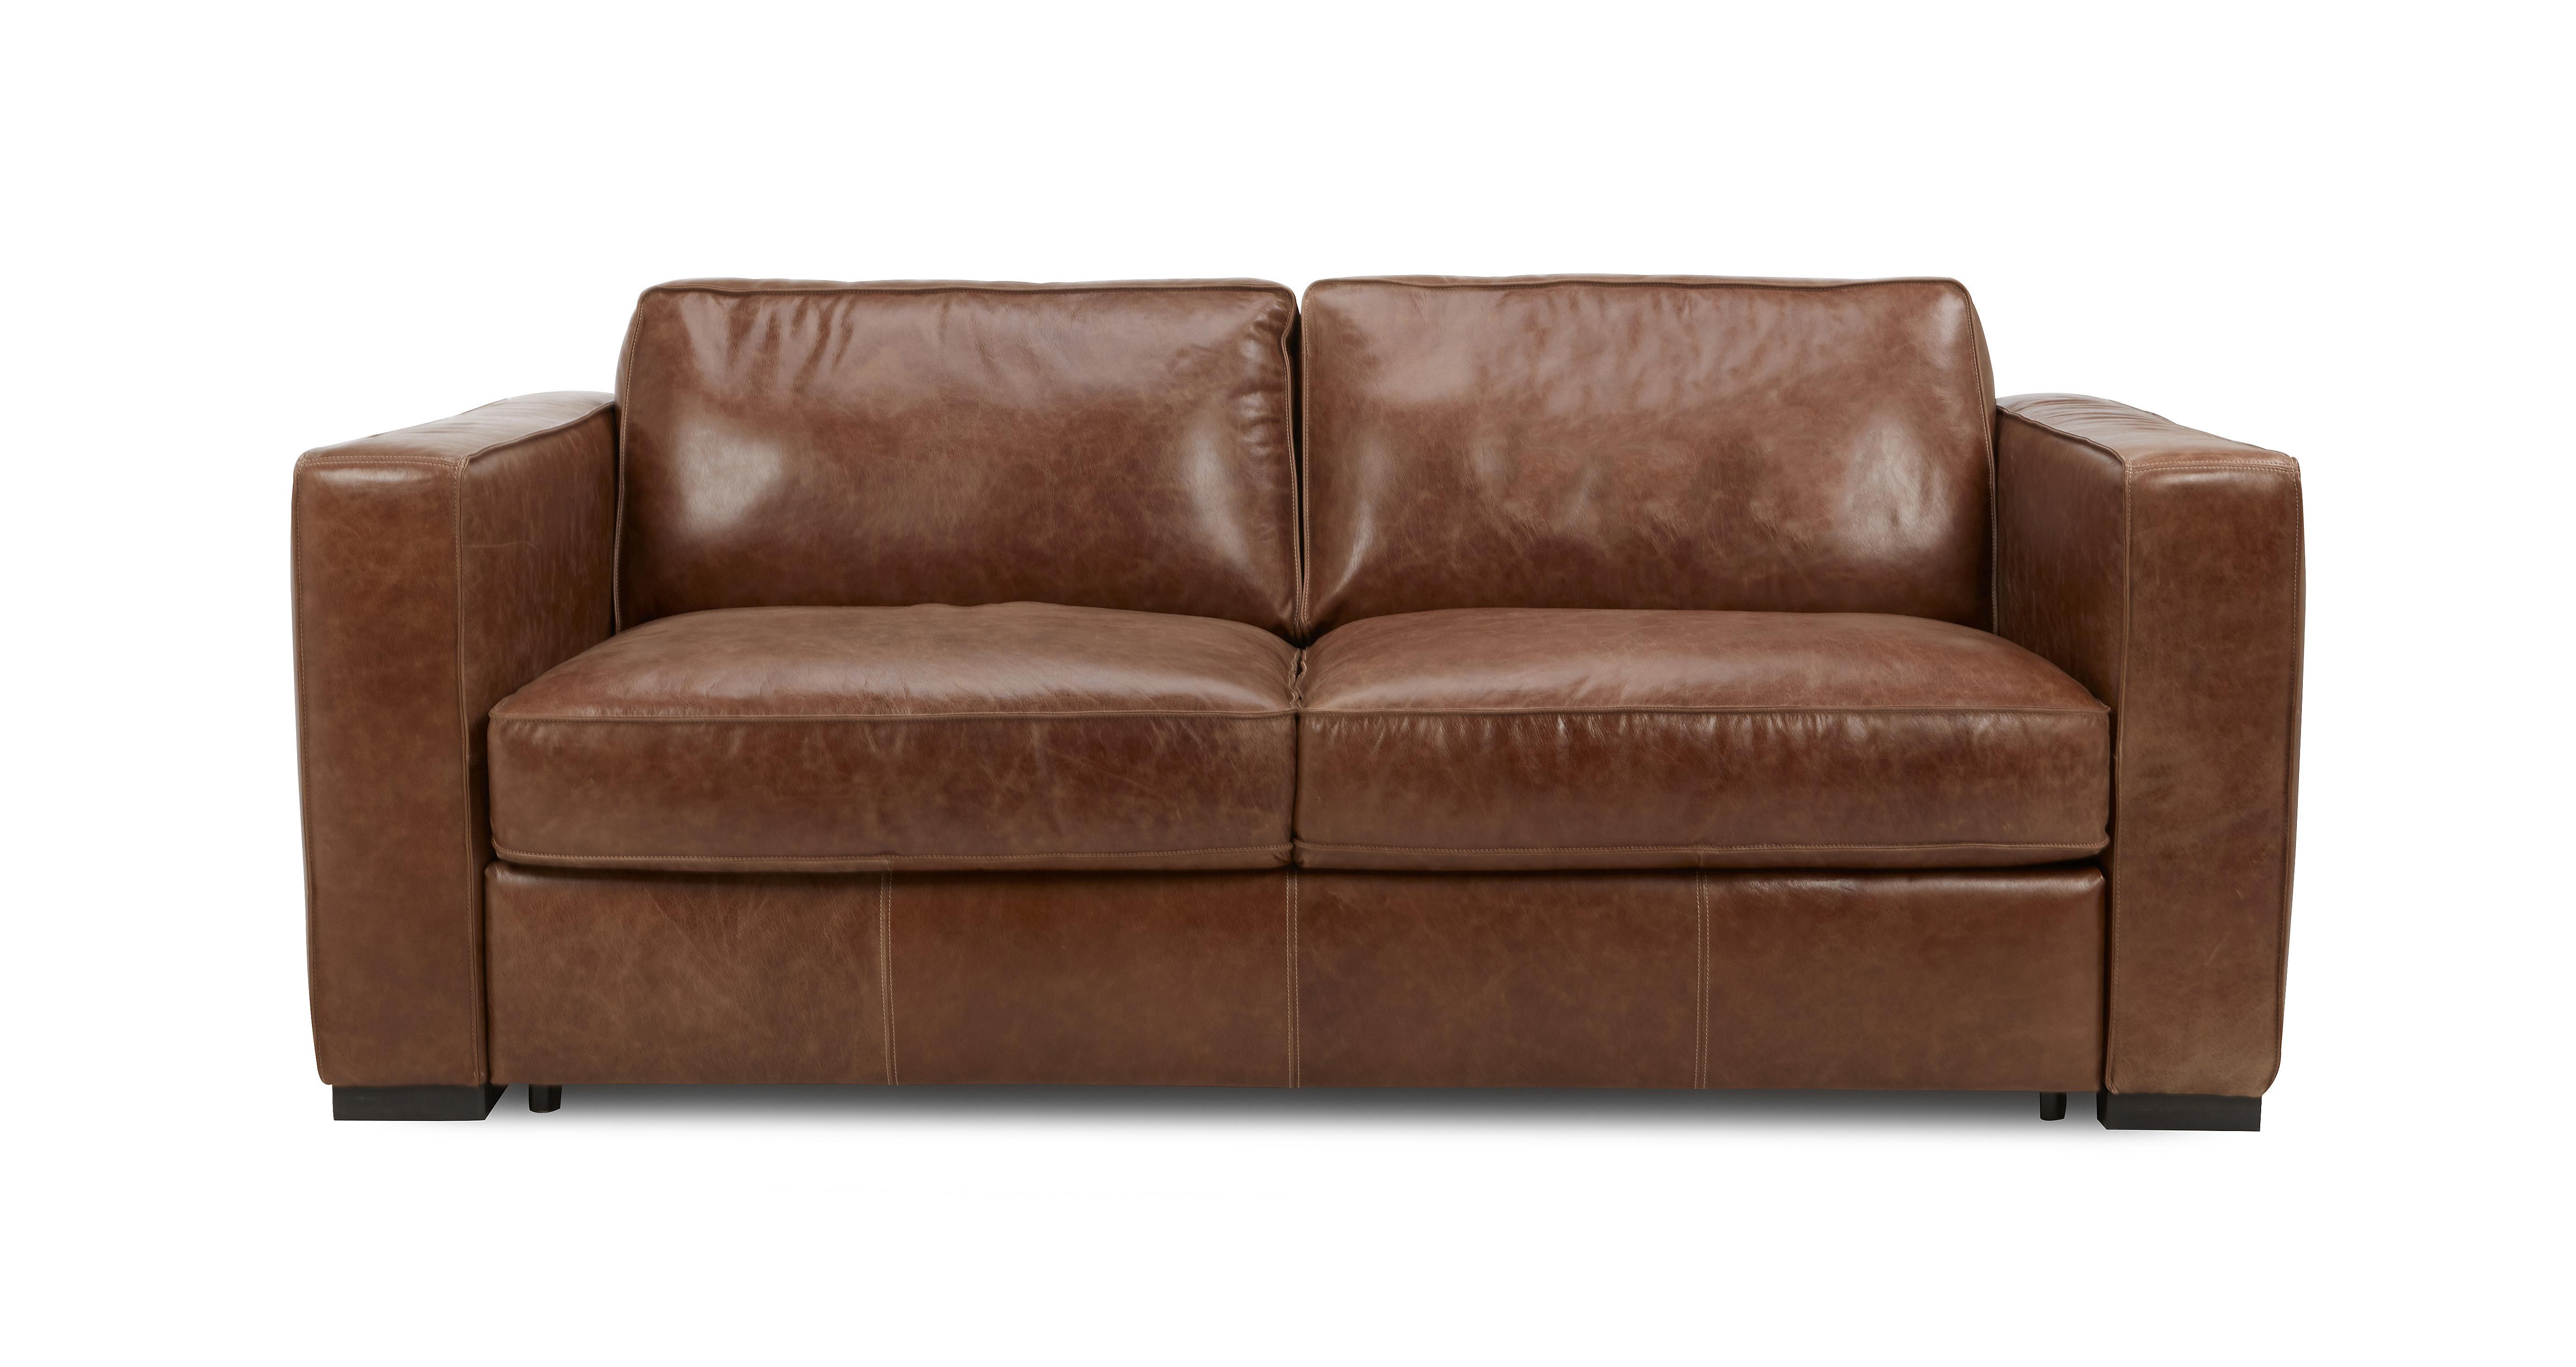 Dakota 3 seater sofa bed fargo contrast dfs ireland for Sofa bed ireland